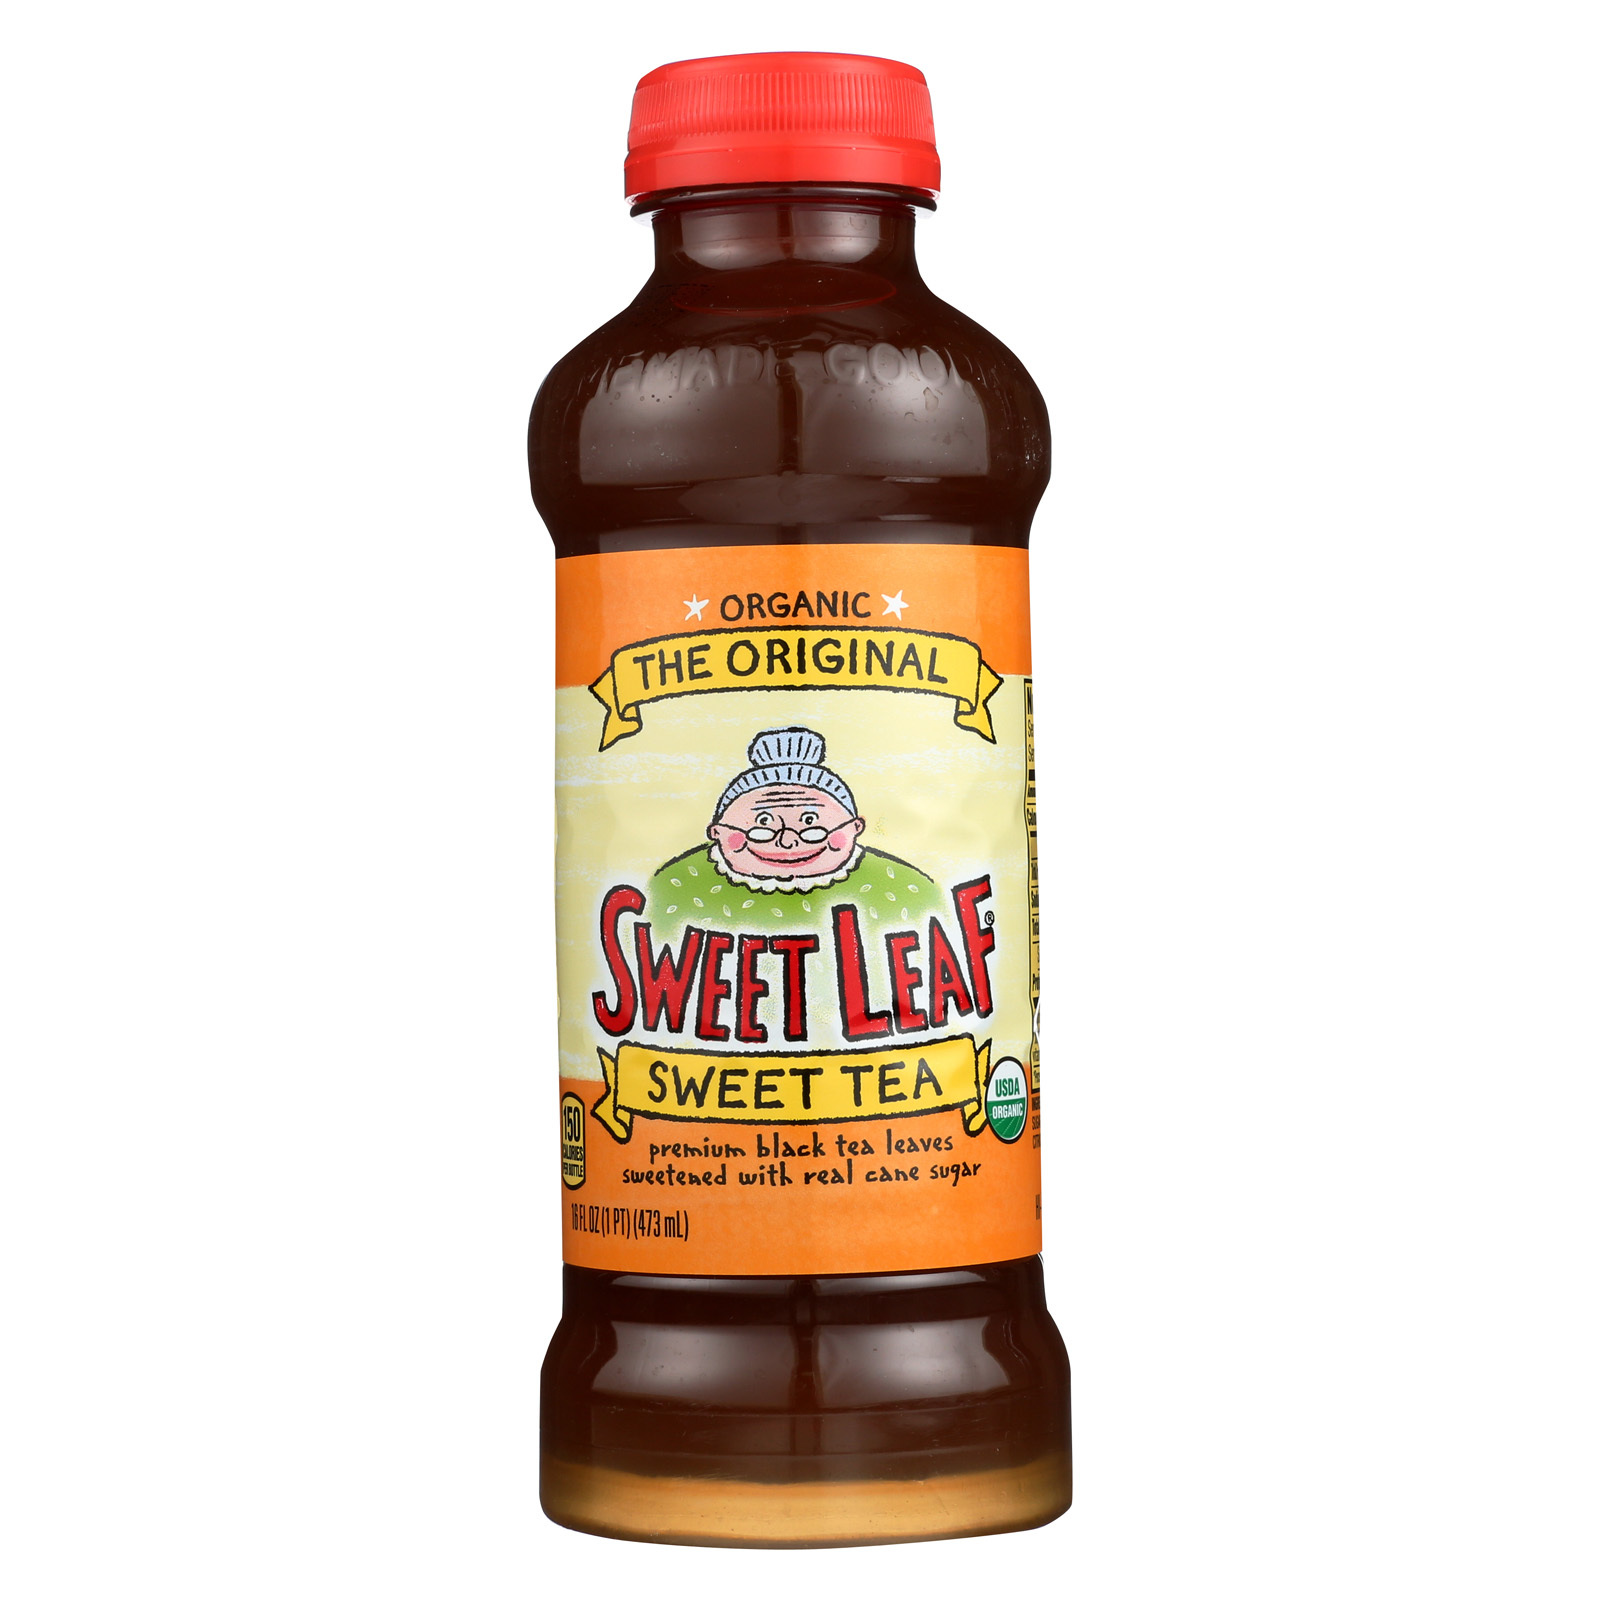 Sweet Leaf Iced Tea - The Original - Case of 12 - 16 Fl oz.